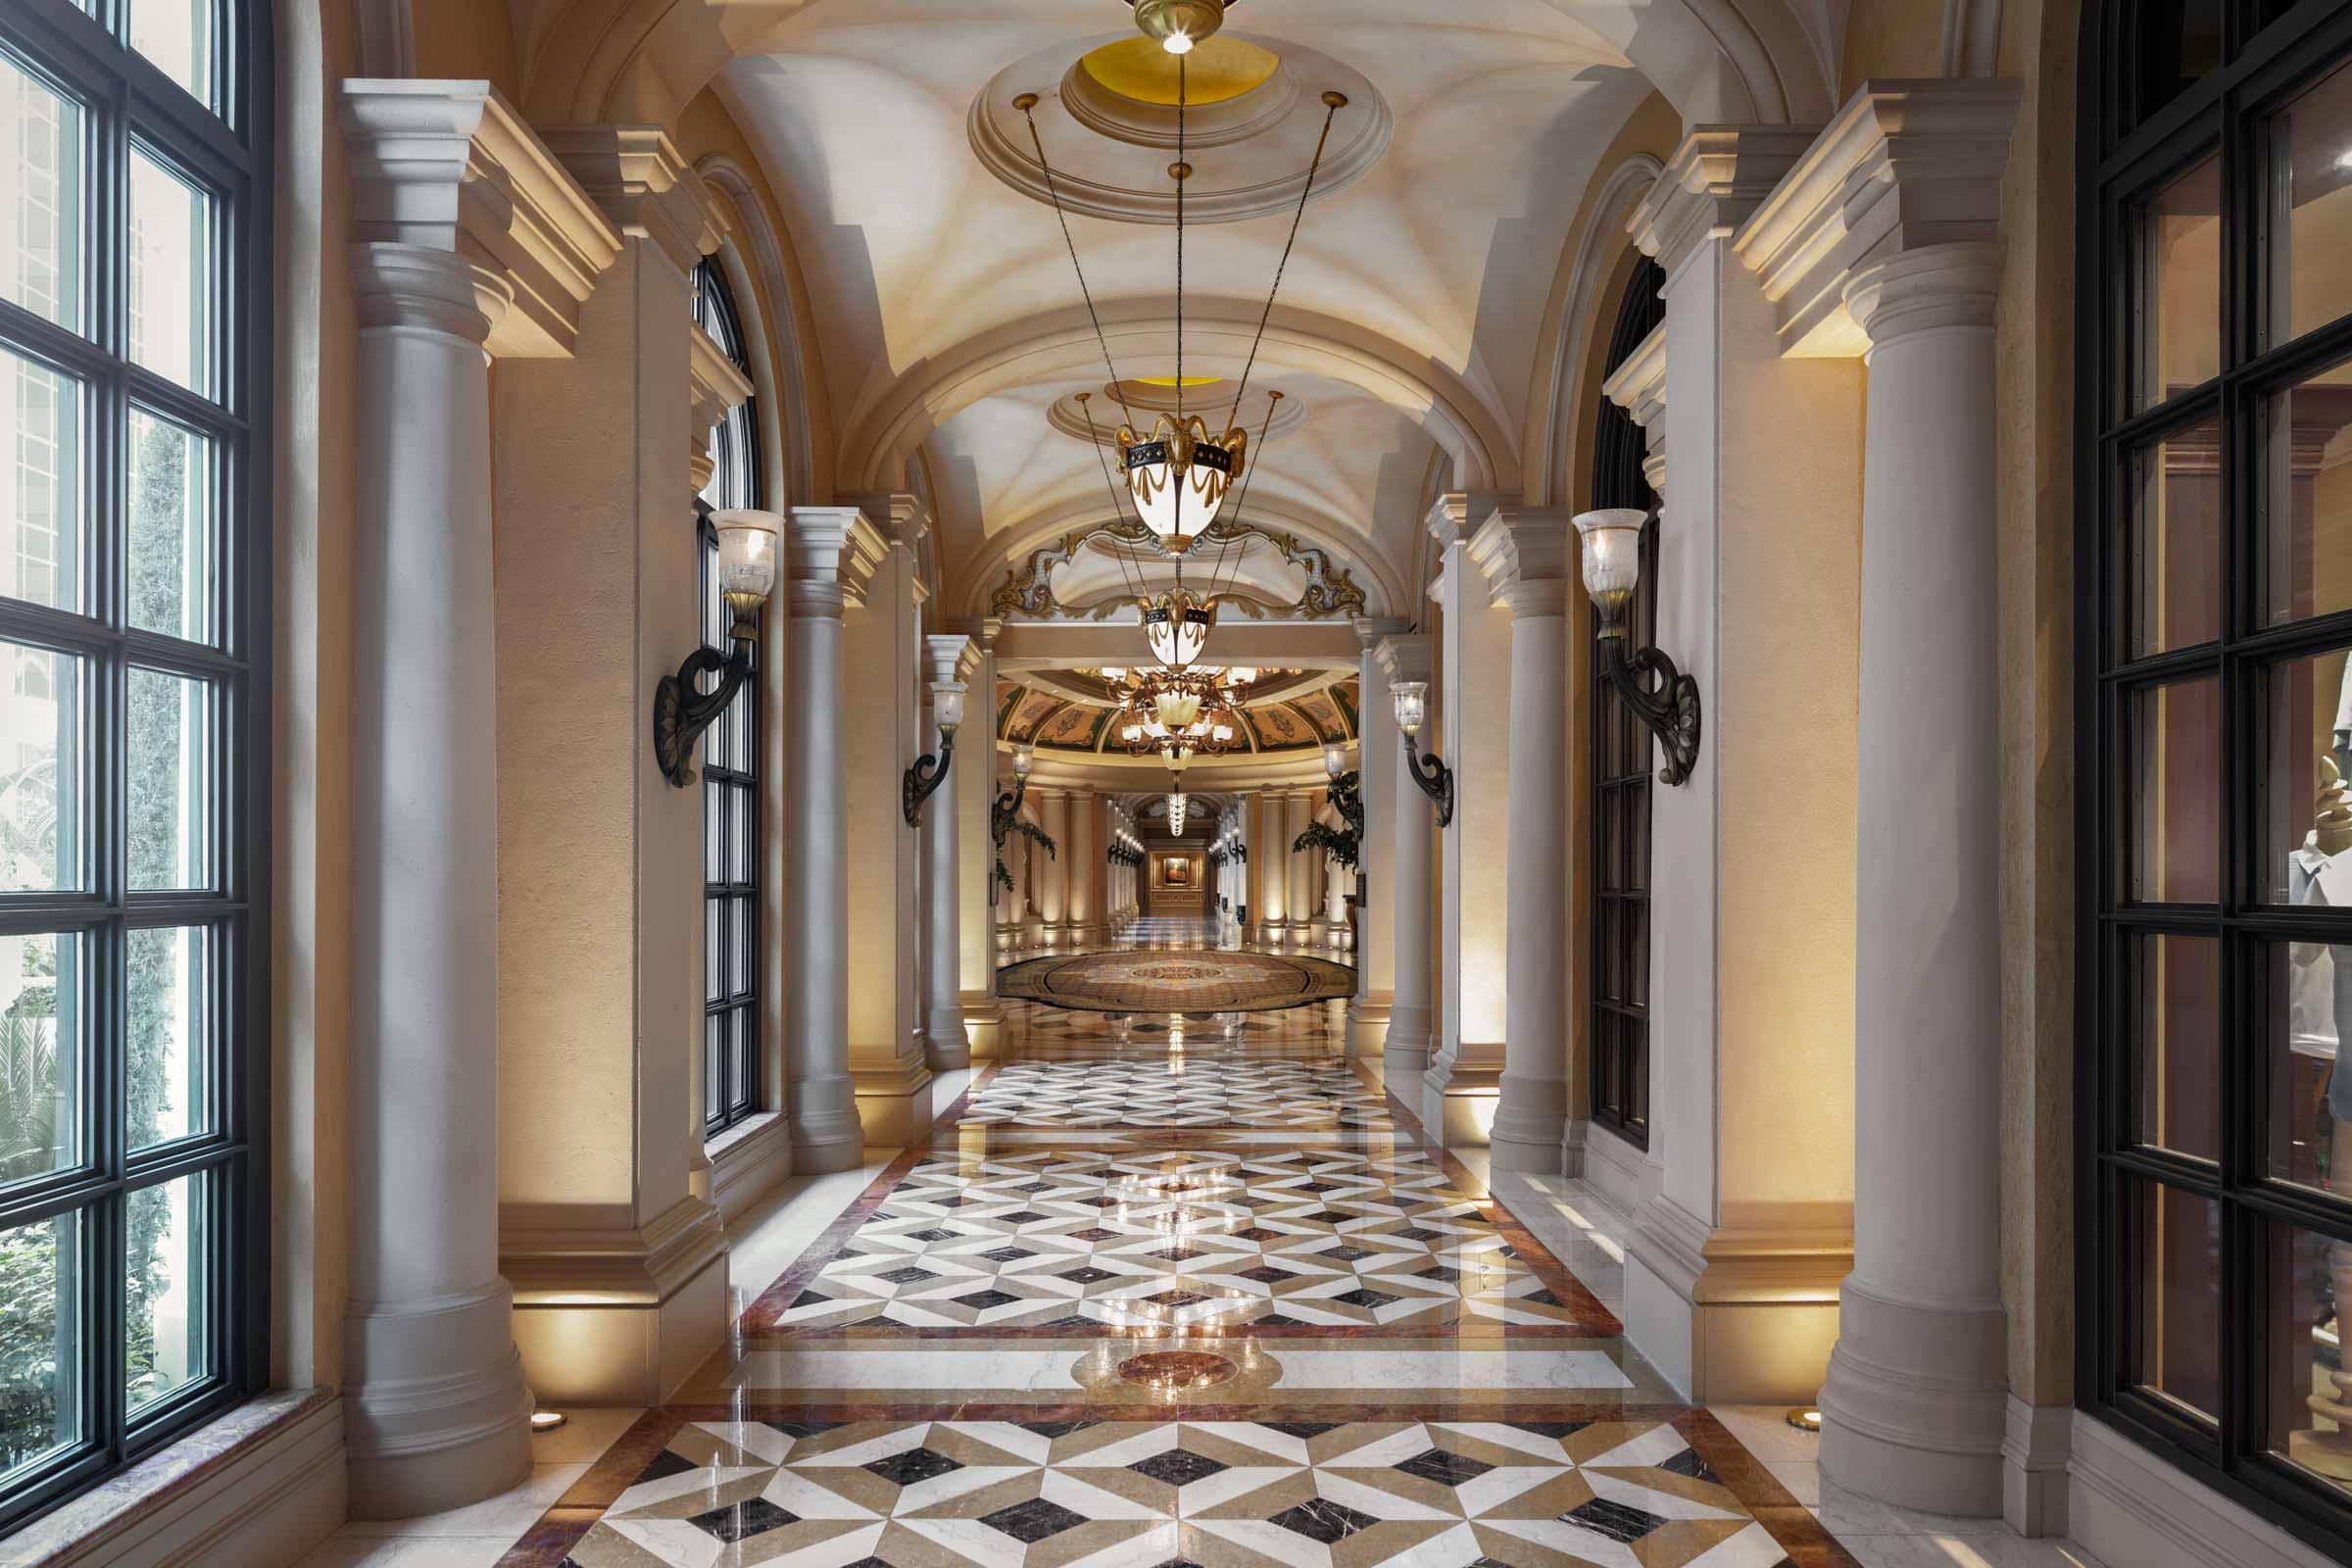 The Venetian 174 Las Vegas Luxury Suite At Venezia Tower